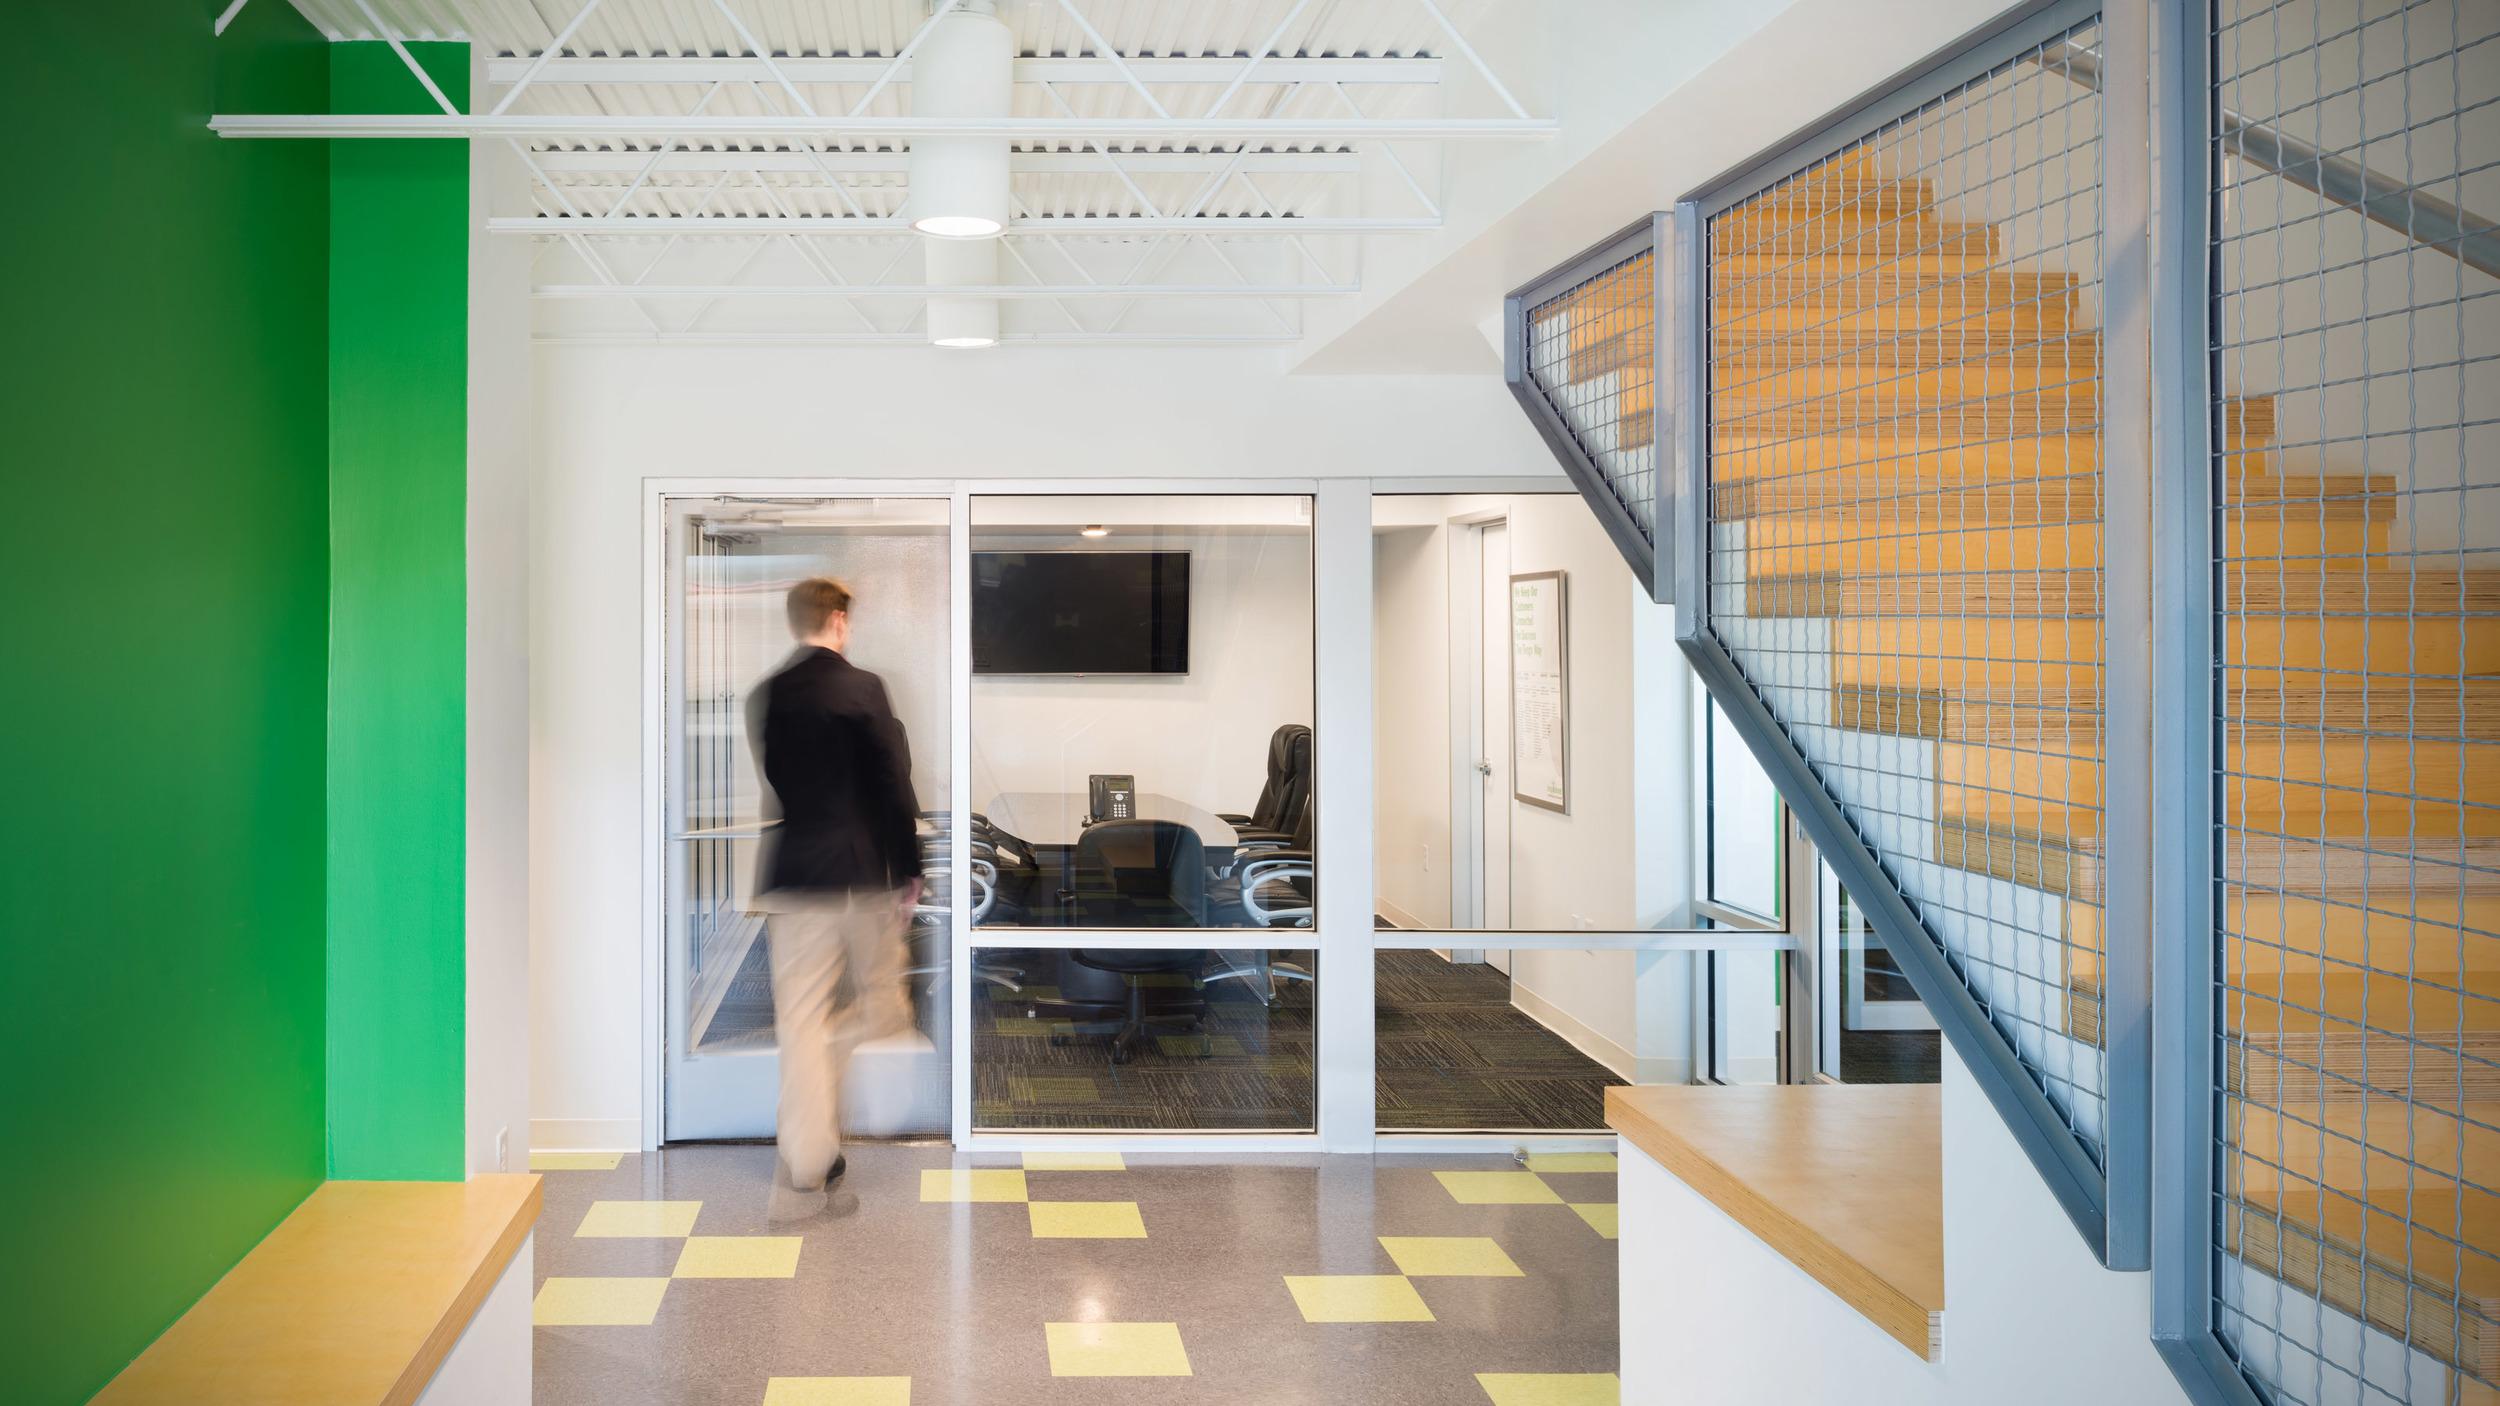 TengoInternet Network Operations Center — HiWorks